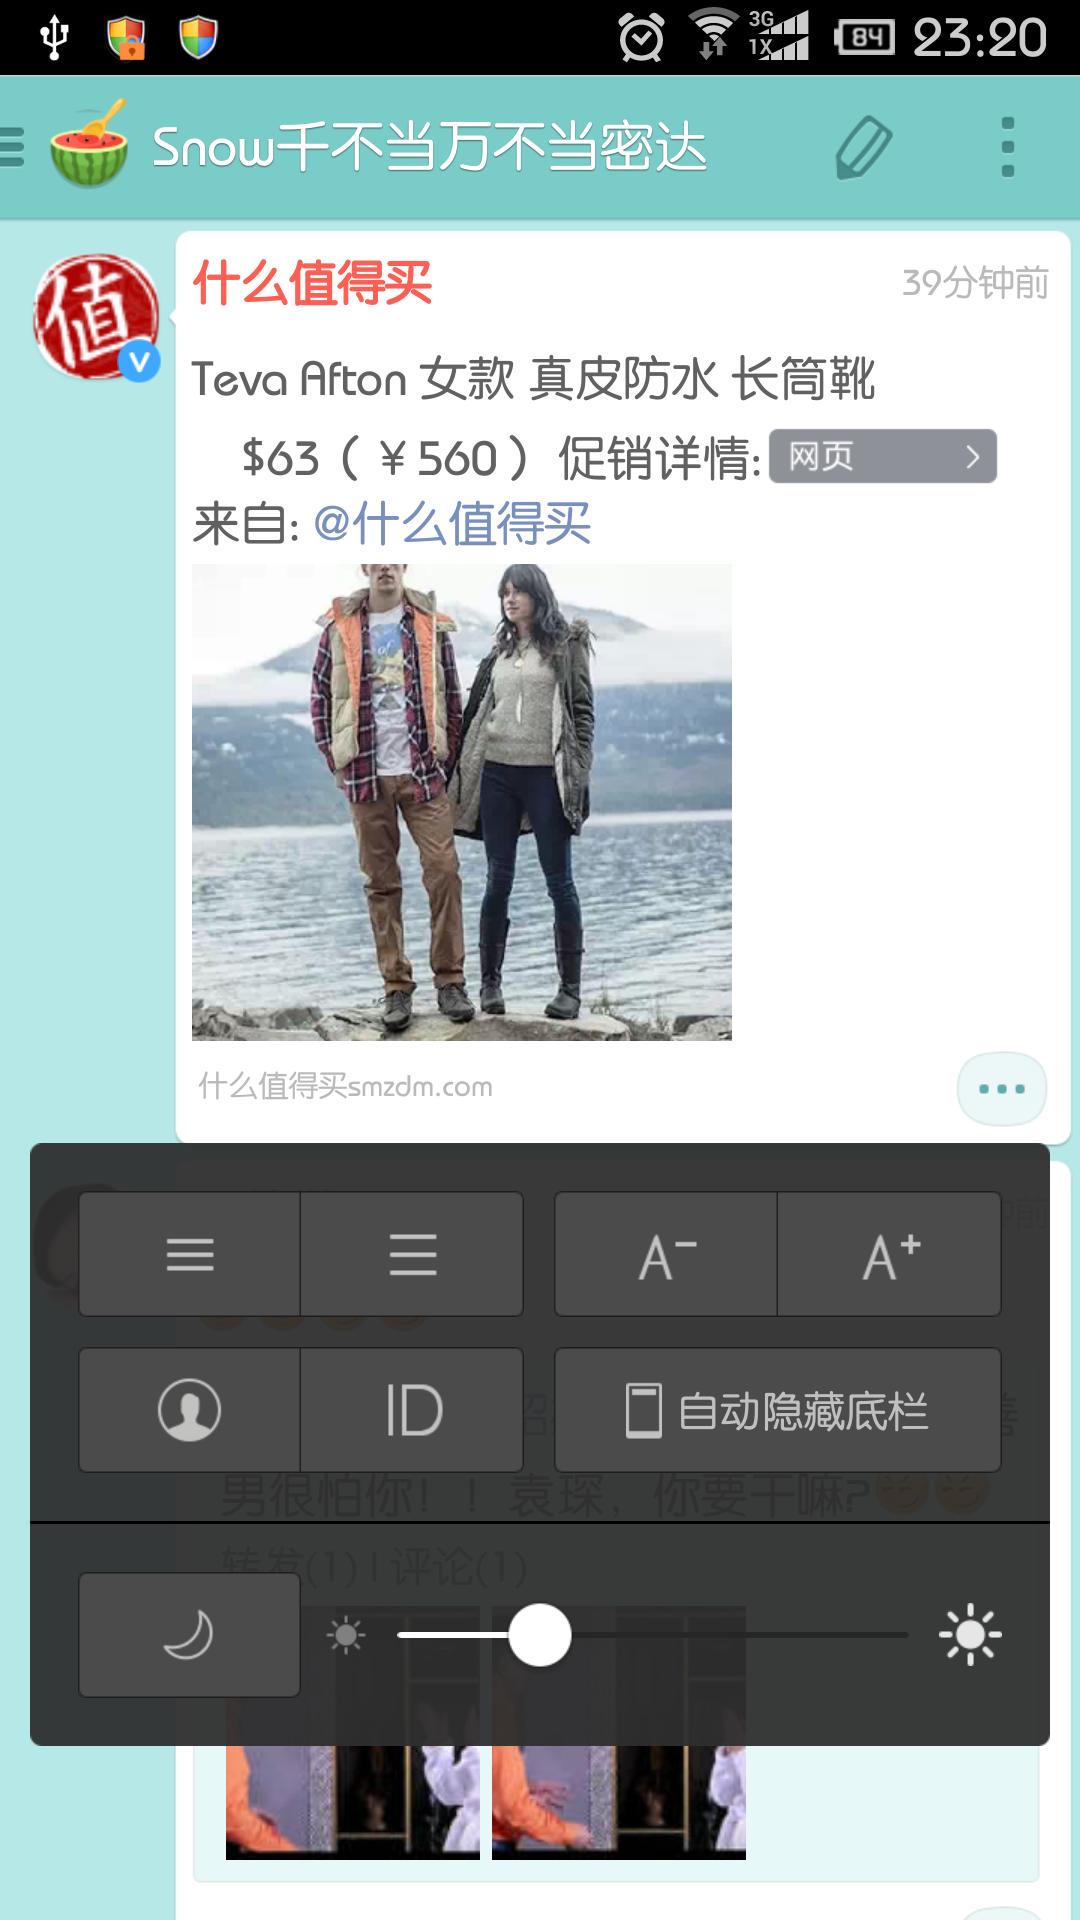 Screenshot_2013-11-20-23-20-38.png